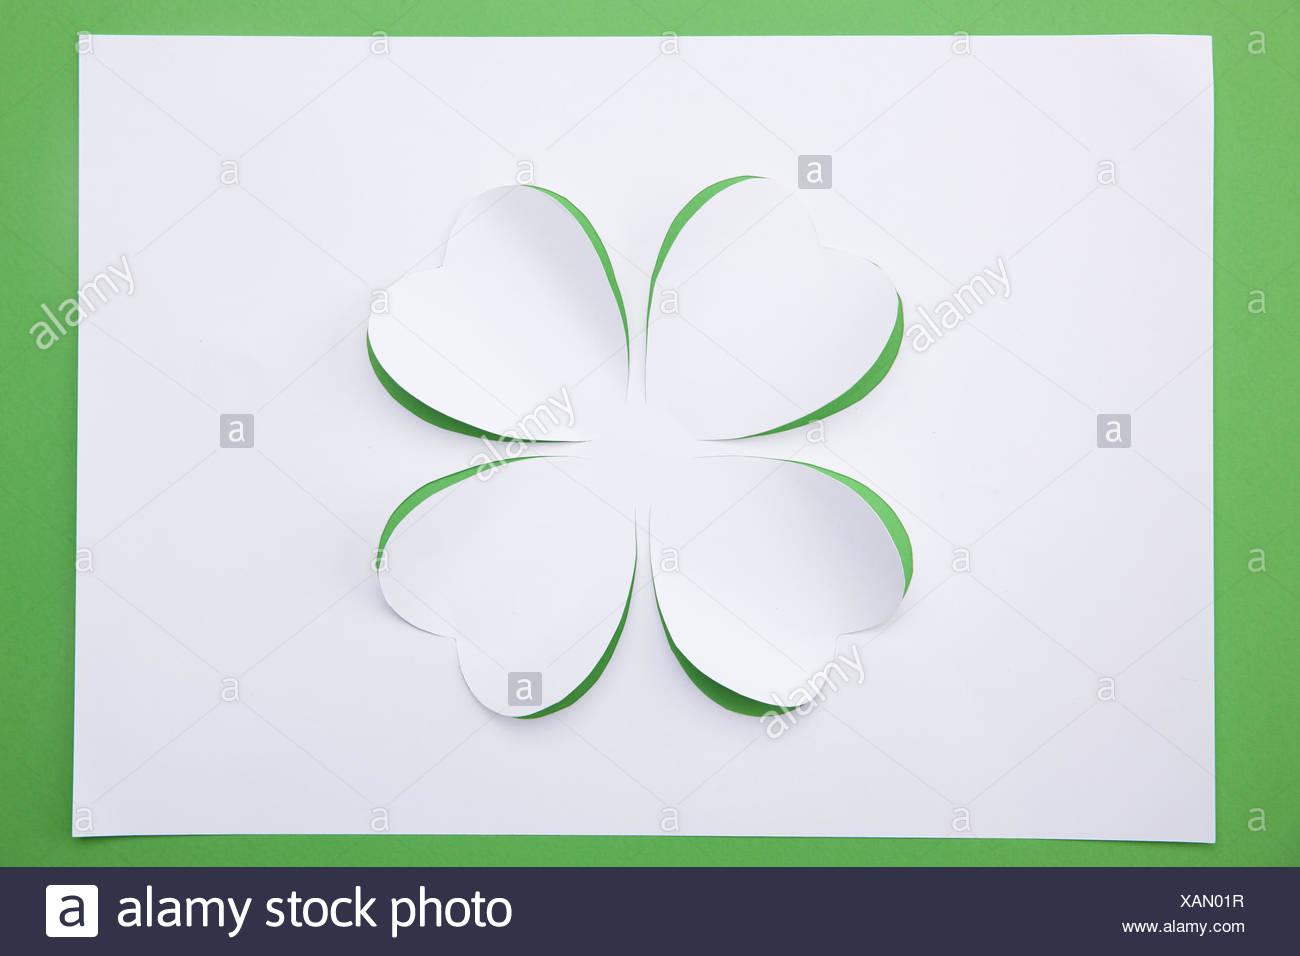 Four-leaf clover, paper art - Stock Image